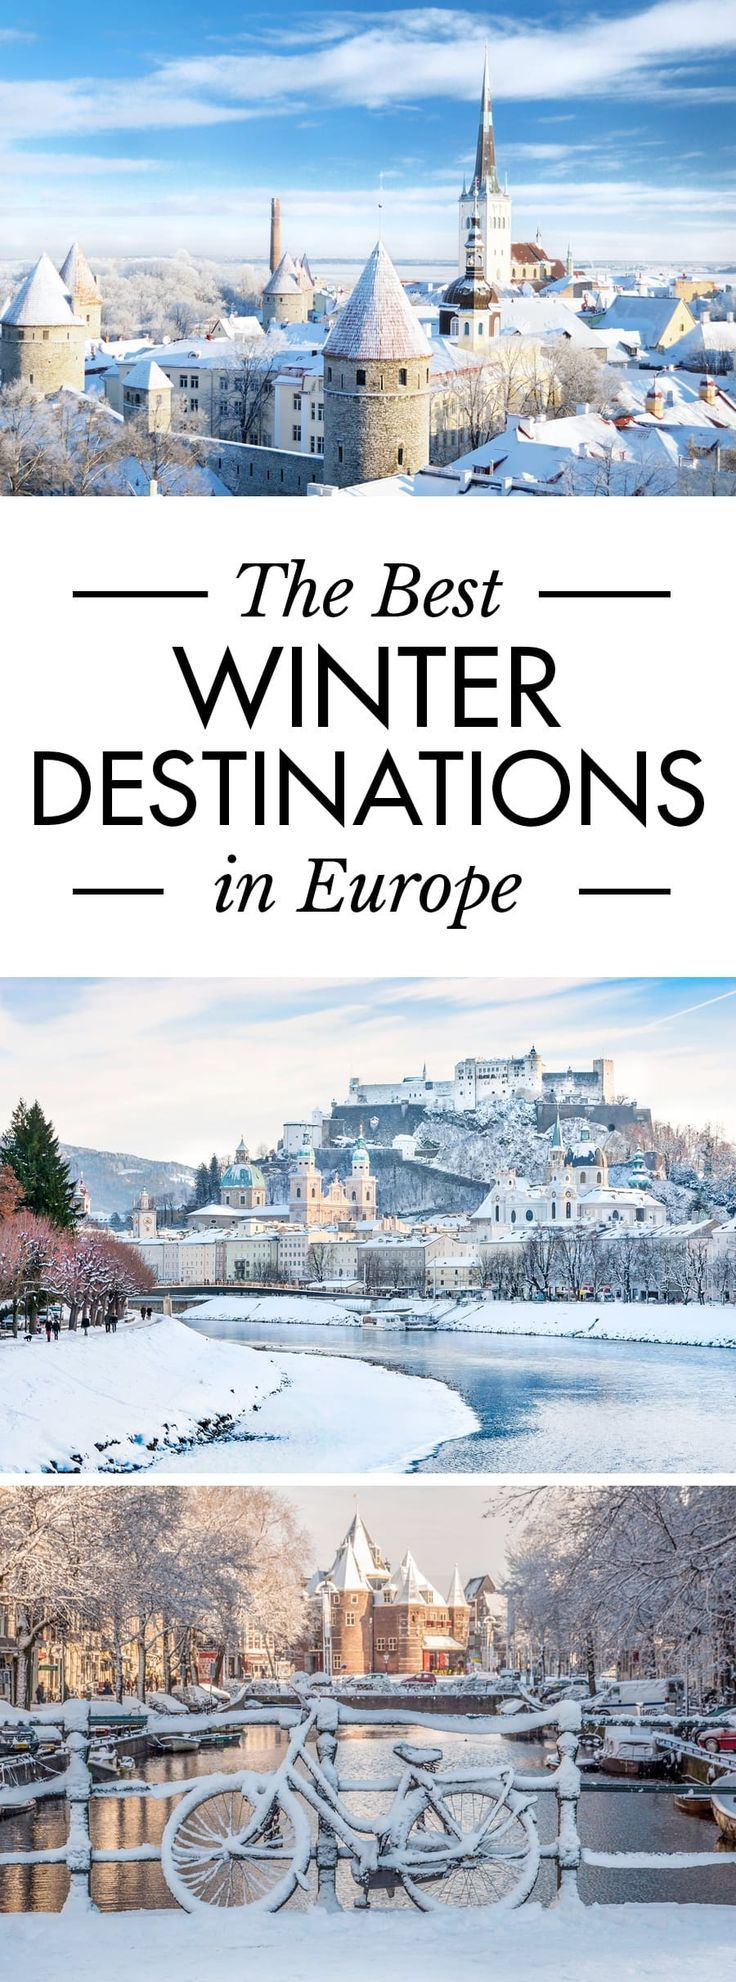 20 Best Winter Destinations in Europe